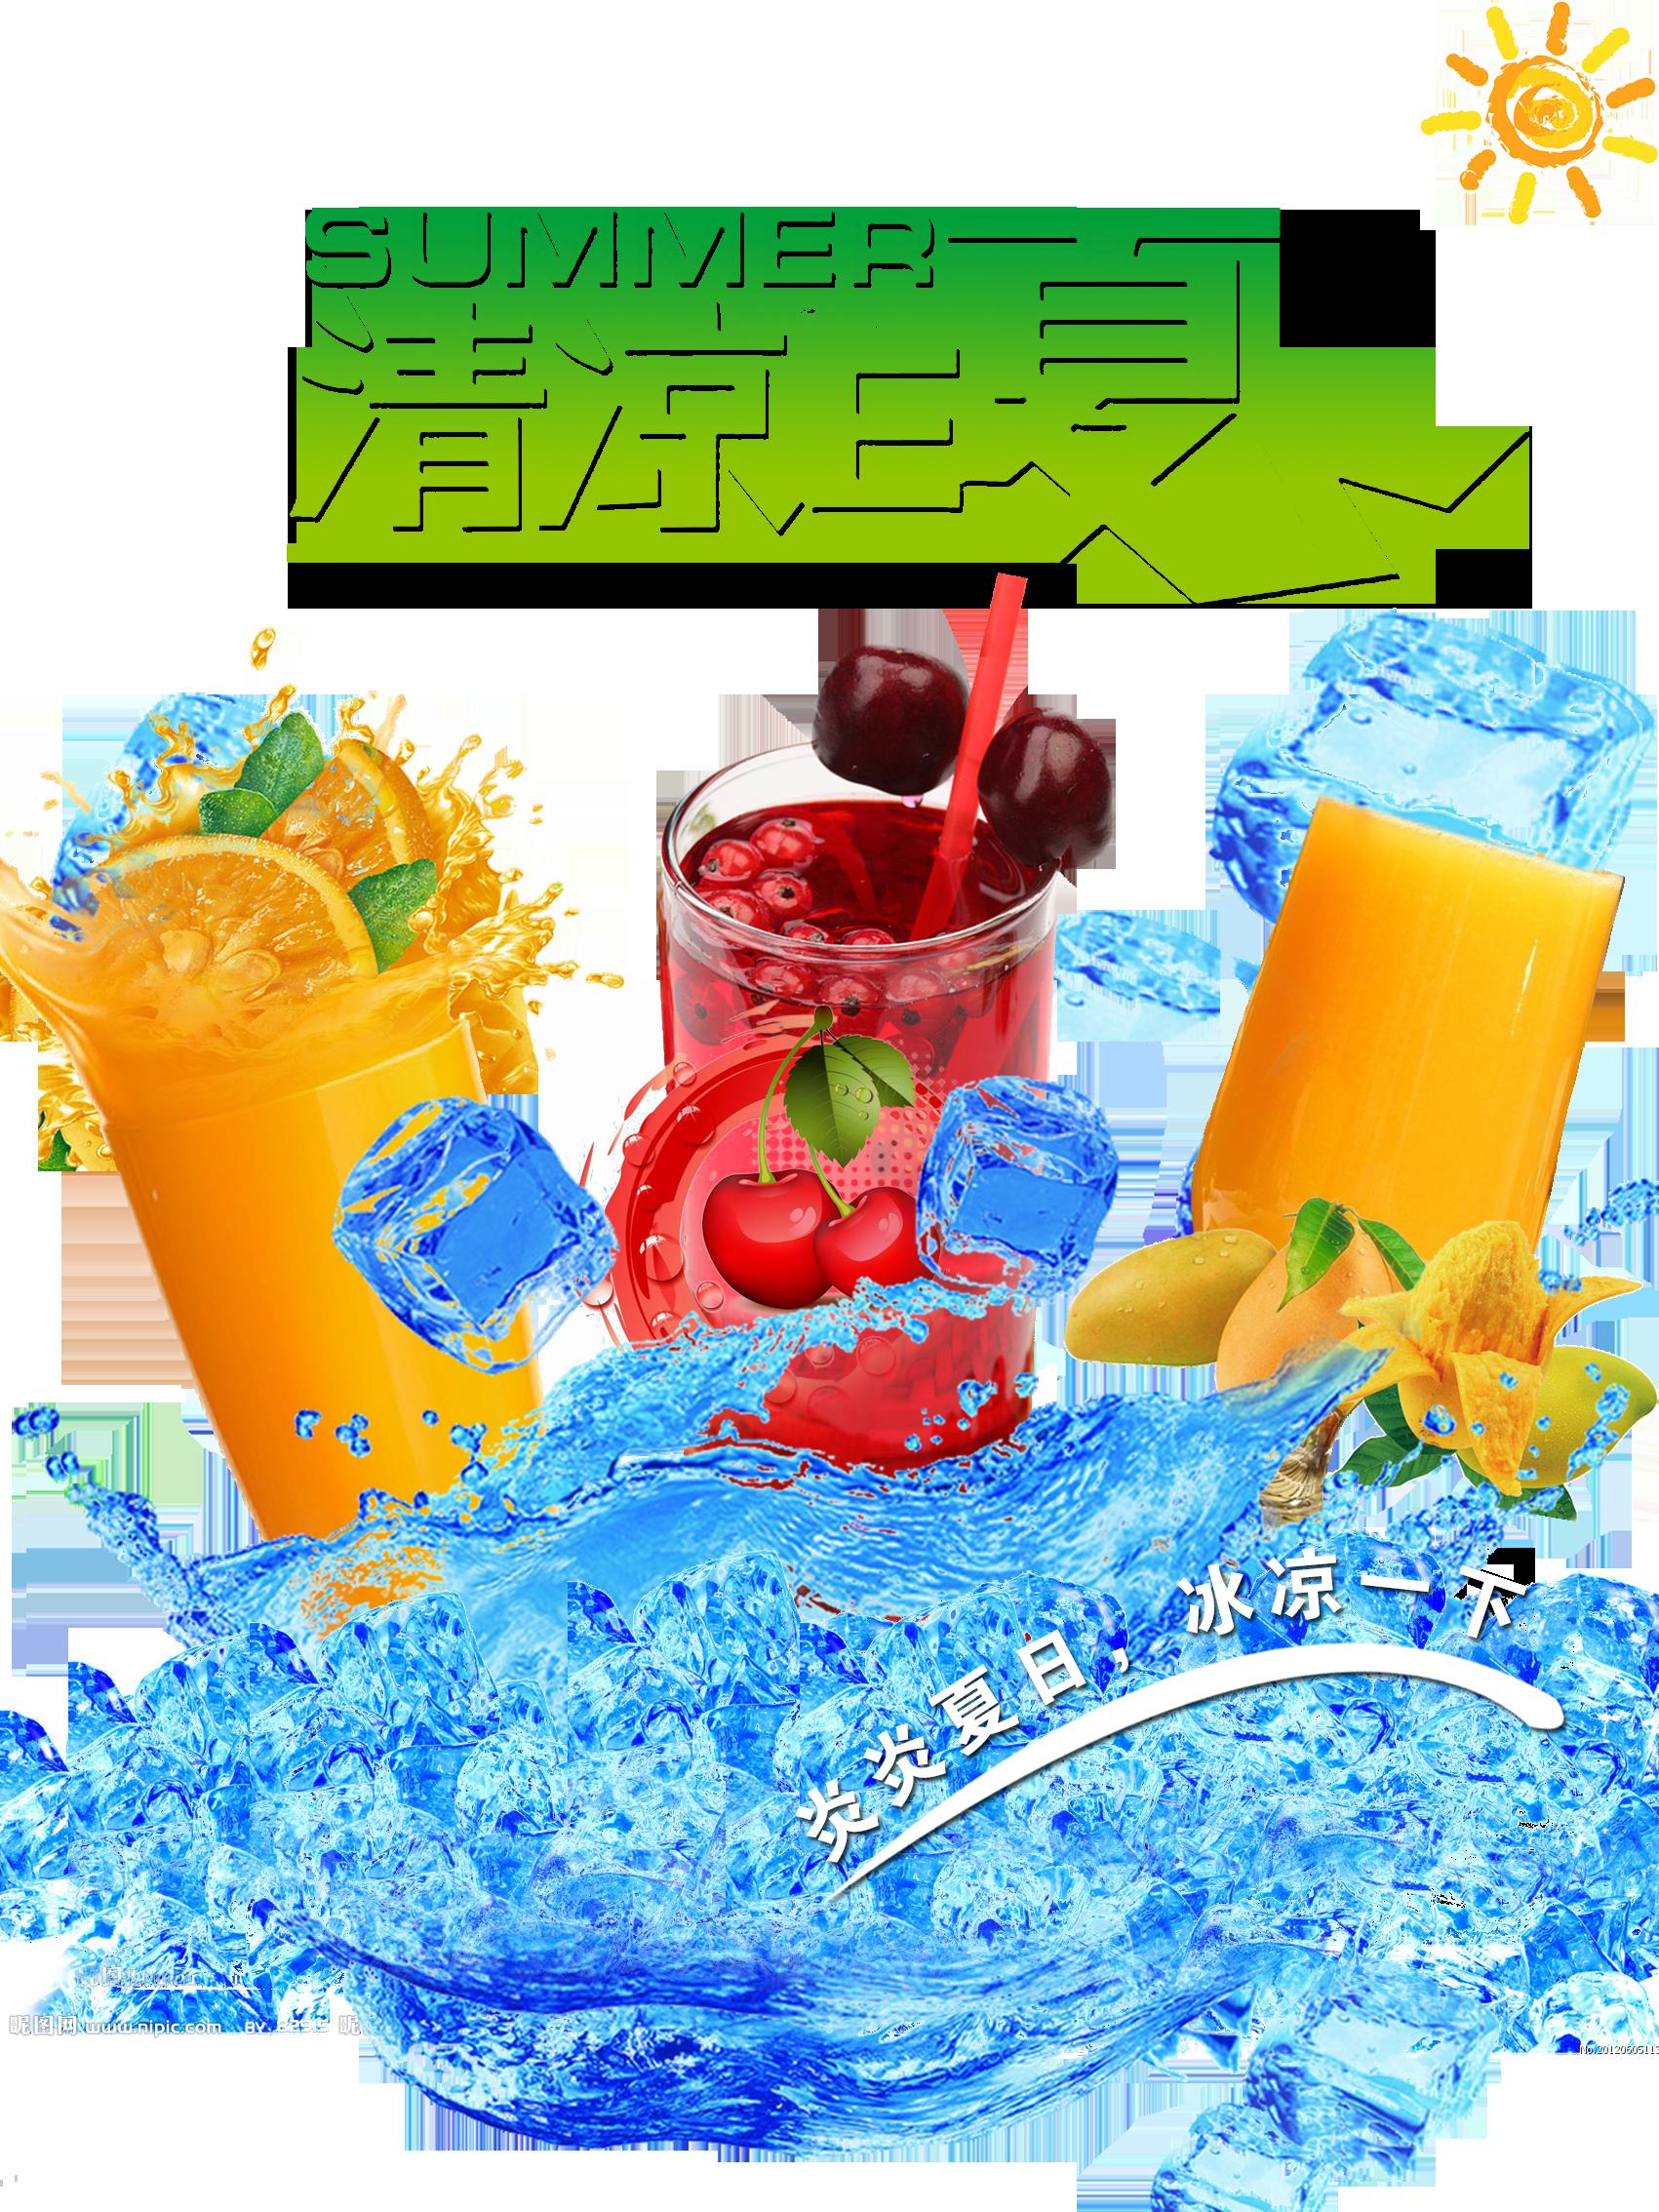 Mango clipart pineapple hawaii. Juice slush poster drink